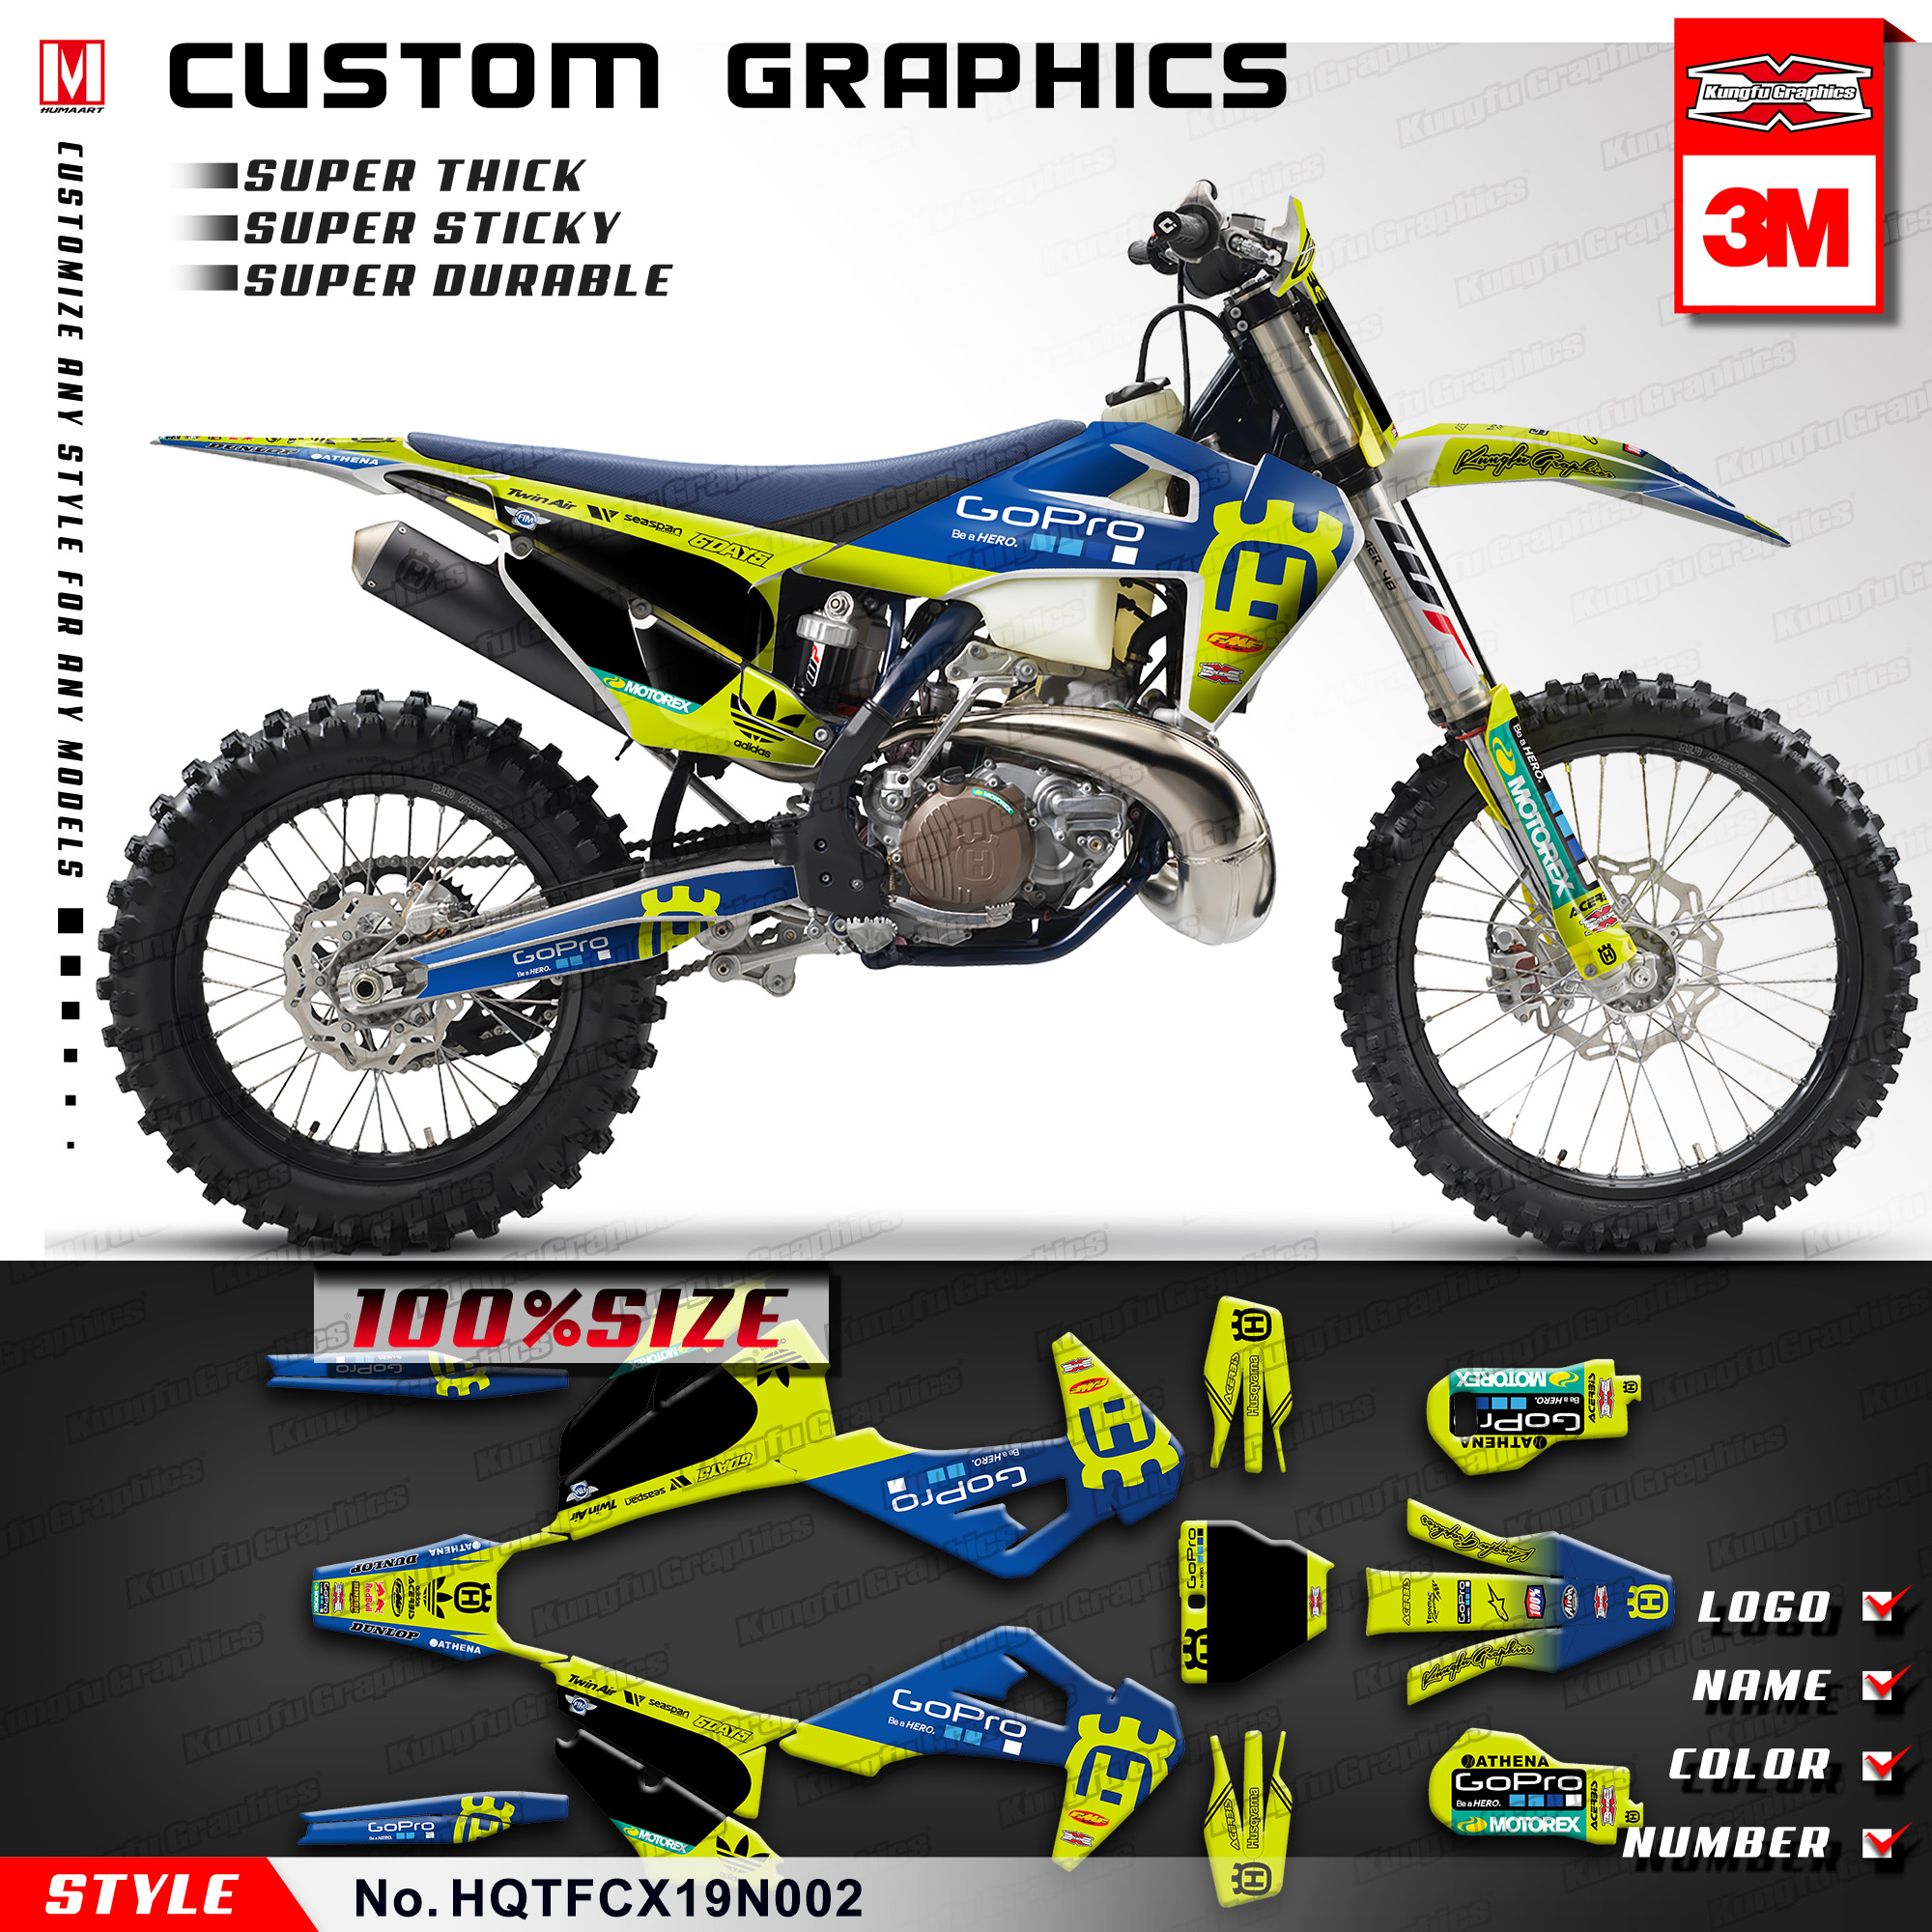 Aufkleber Sticker Autocollant Adesivi Aufkleber Decal Motocross Husqvarna